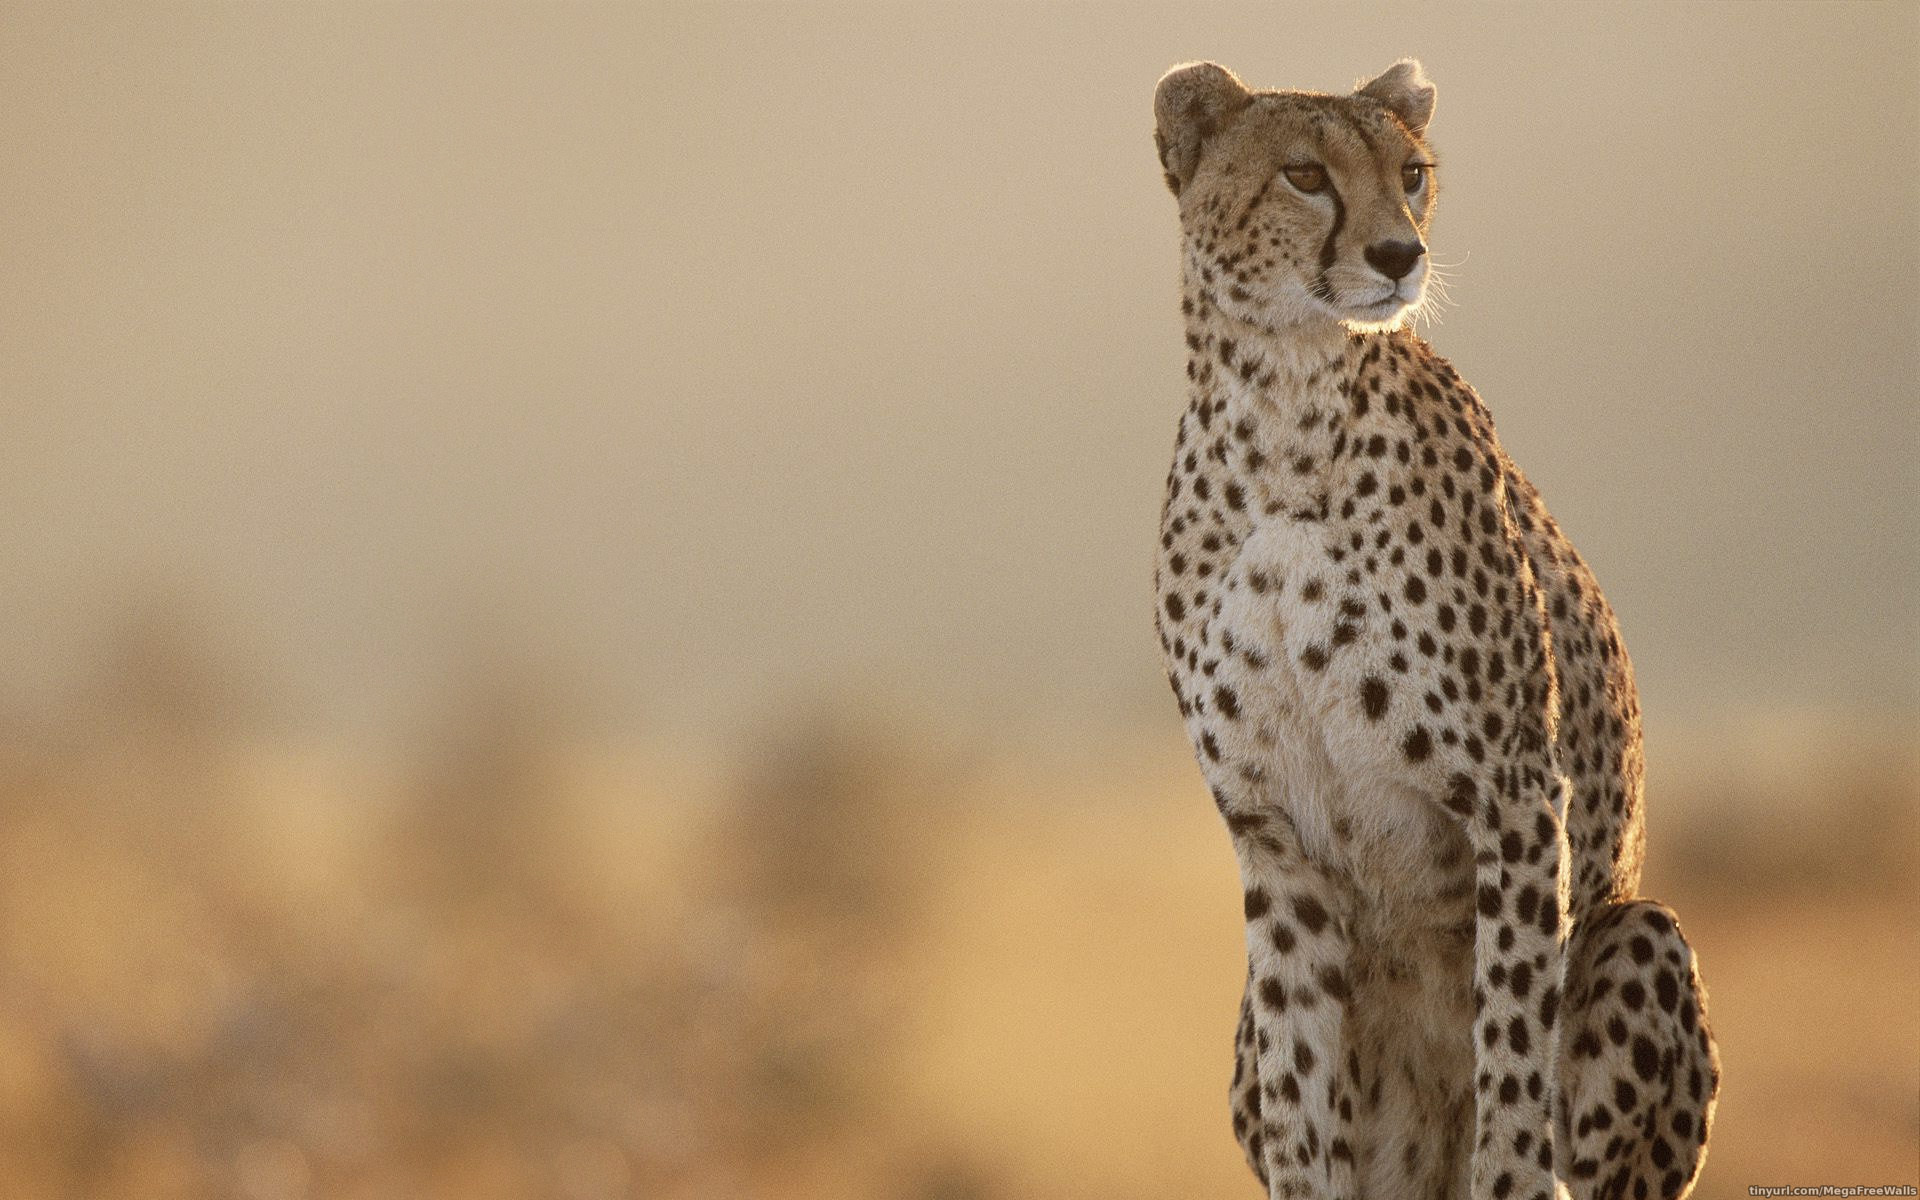 Wallpaper Cheetah Pair Hd Animals 6057: Cheetah Wallpaper HD ·① WallpaperTag